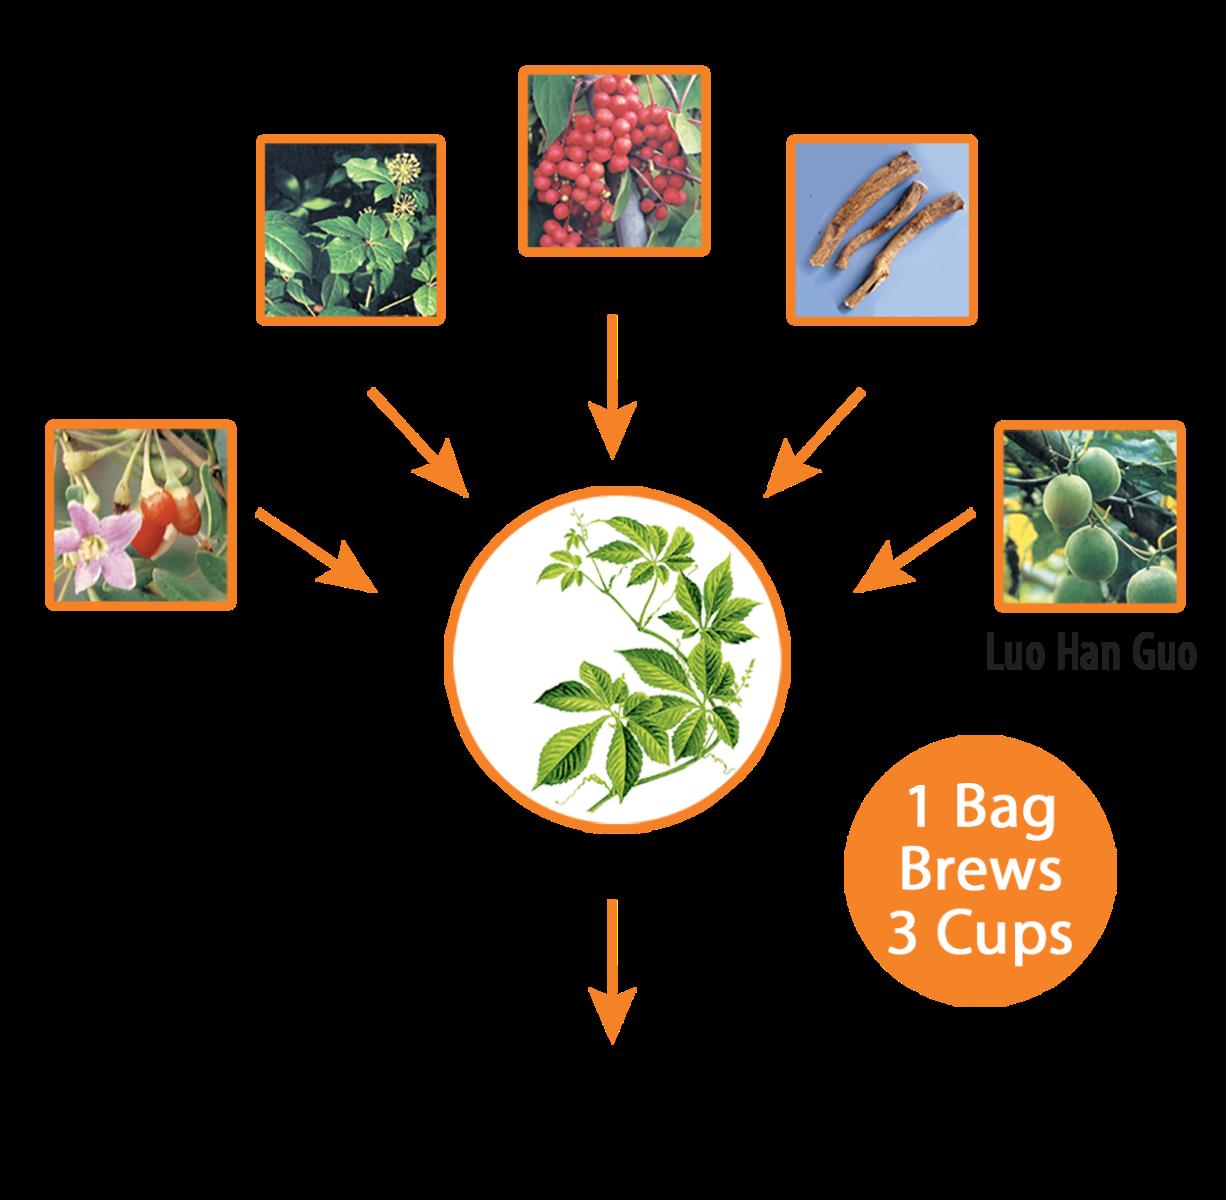 sip-technology-illustration